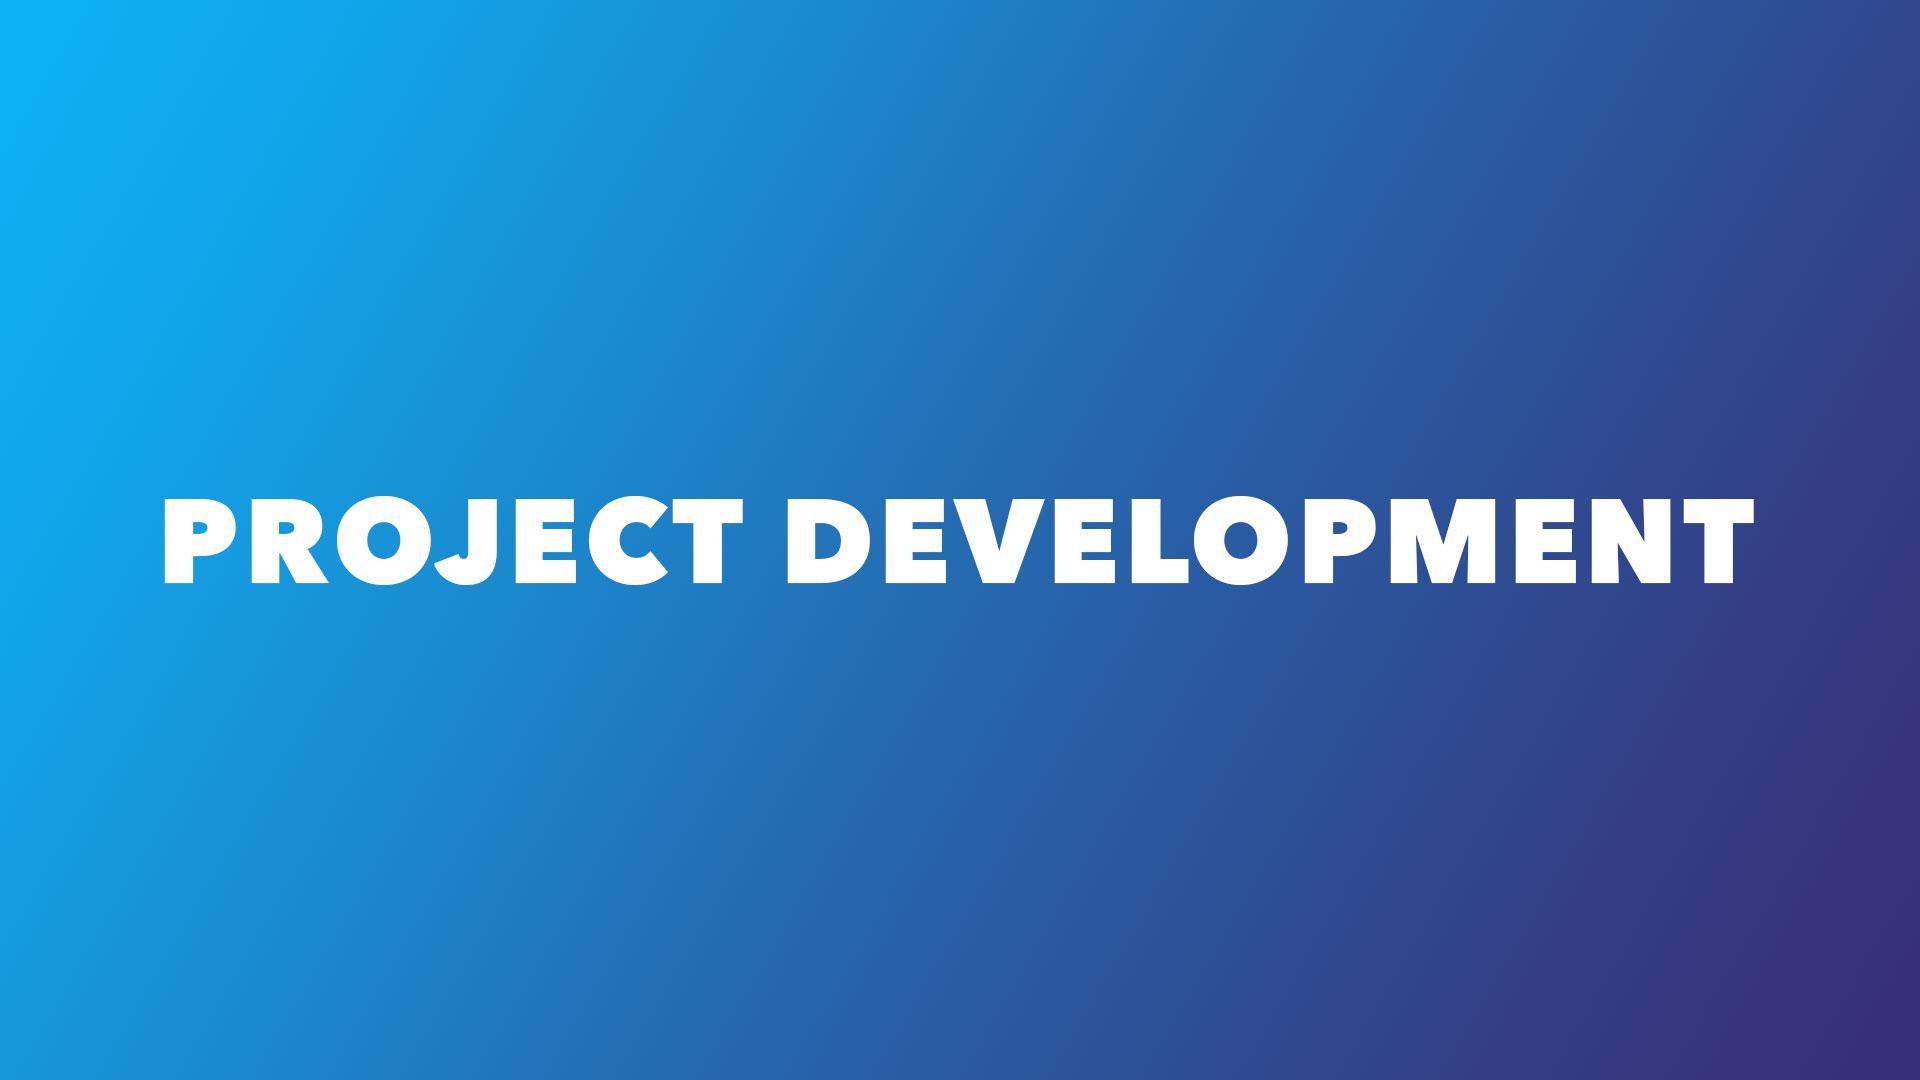 projectdevelopment.jpg